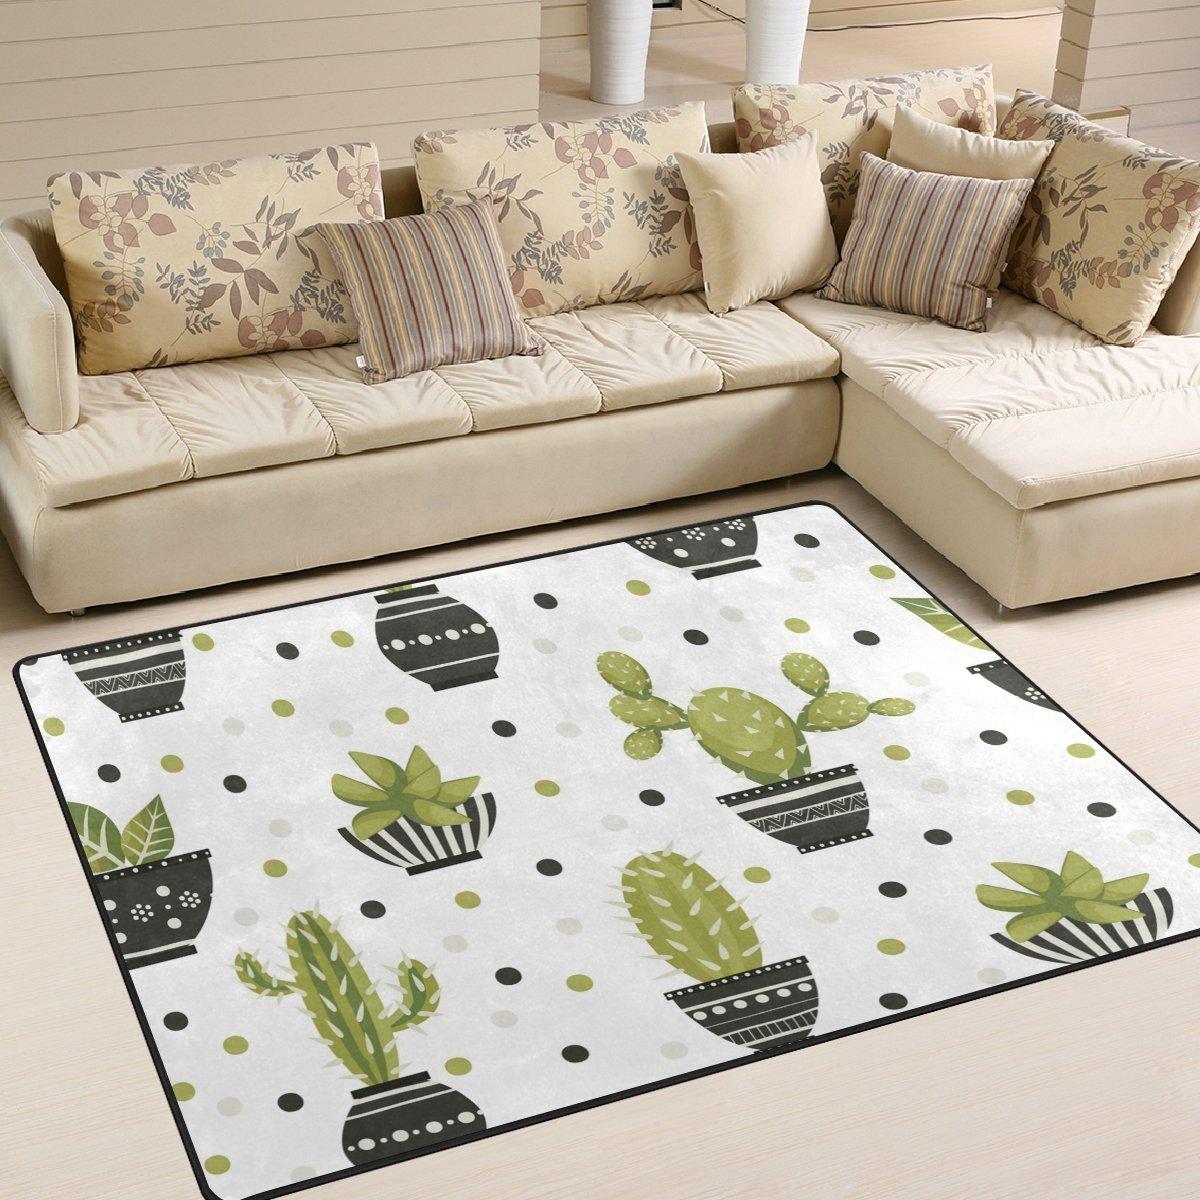 YZGO Cacti Flowerpots Polka Dots Pattern Kids Area Rug, Non-Slip Floor Mat Soft Resting Area Doormats for Living Dining Bedroom 5.3' x 4'